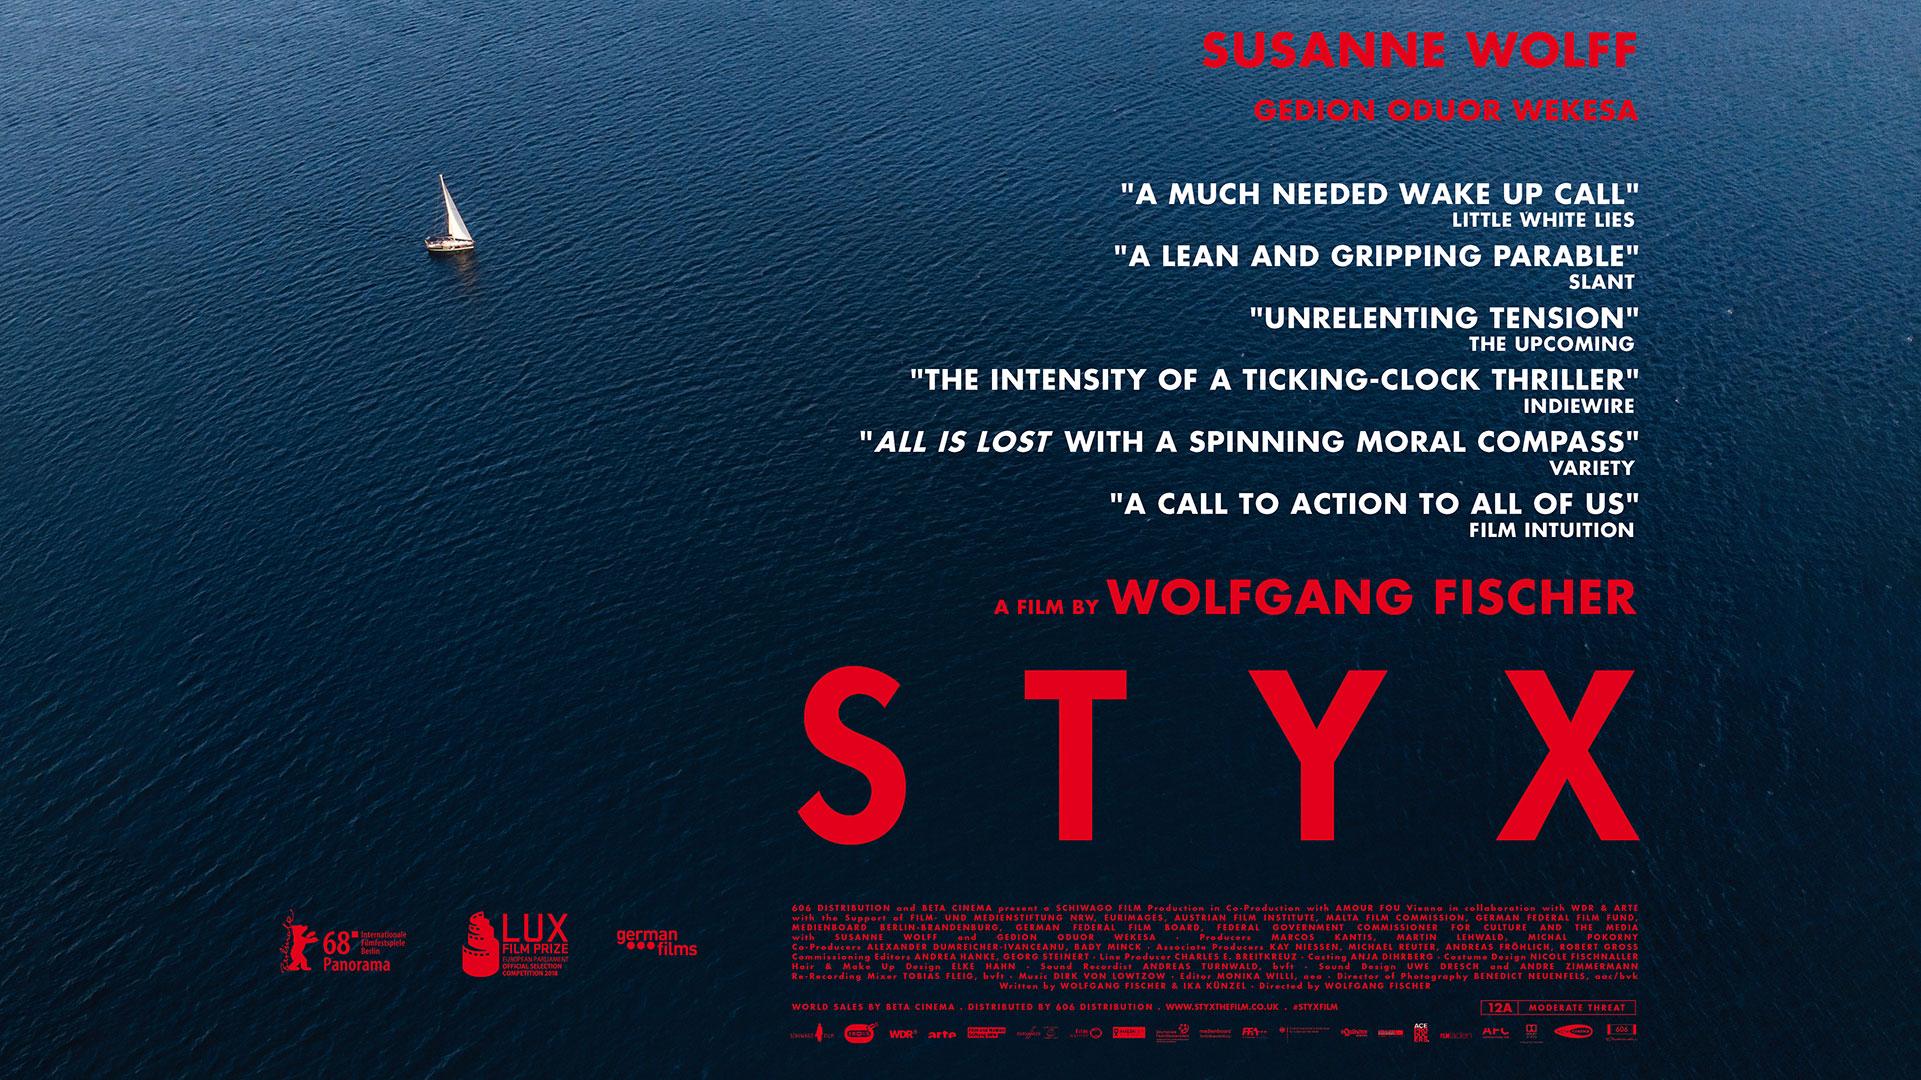 Resultado de imagem para styx Wolfgang Fischer Poster